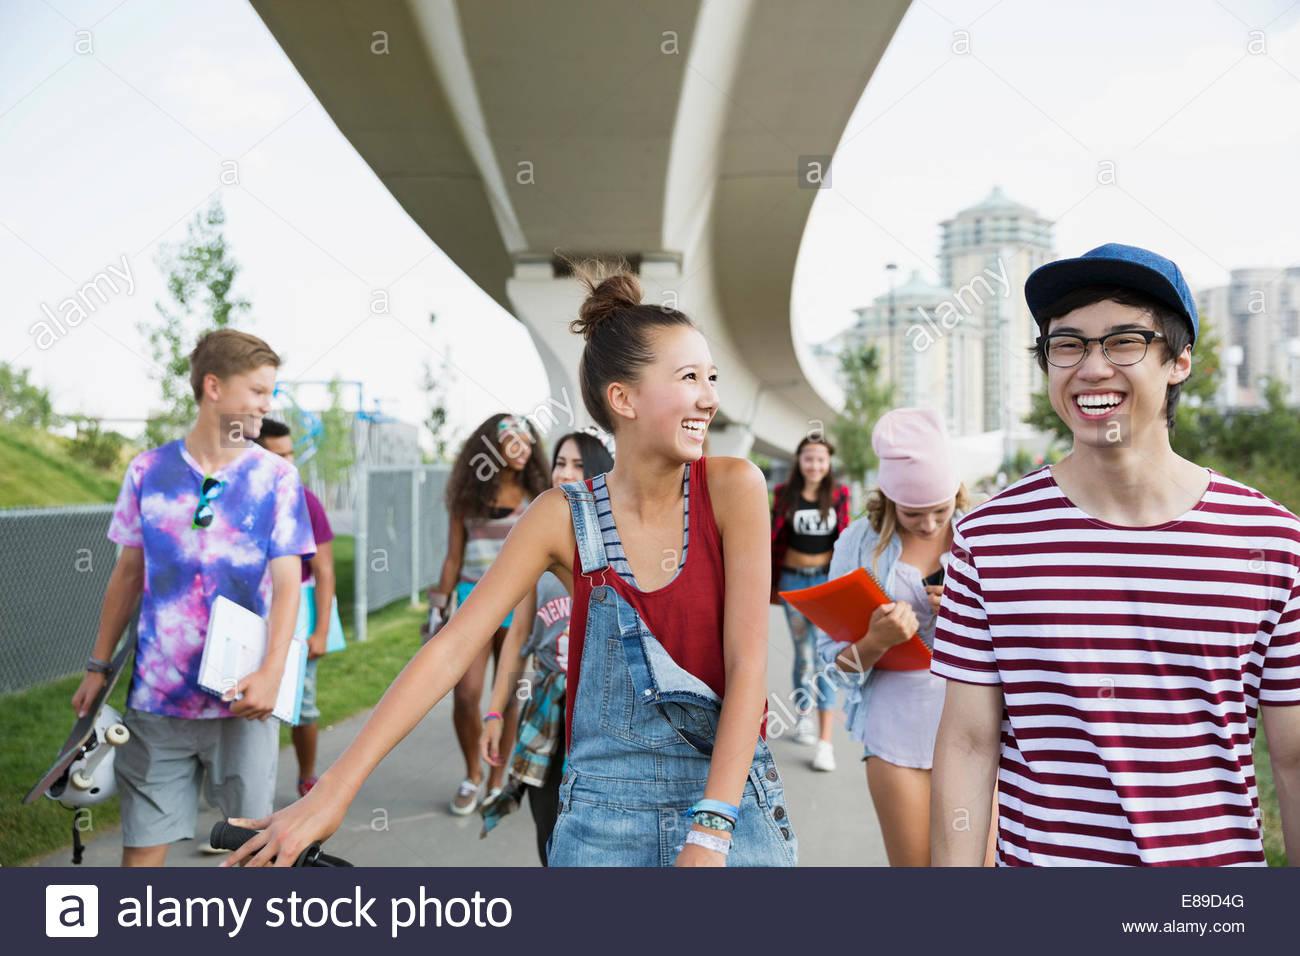 Balades adolescents rire Photo Stock